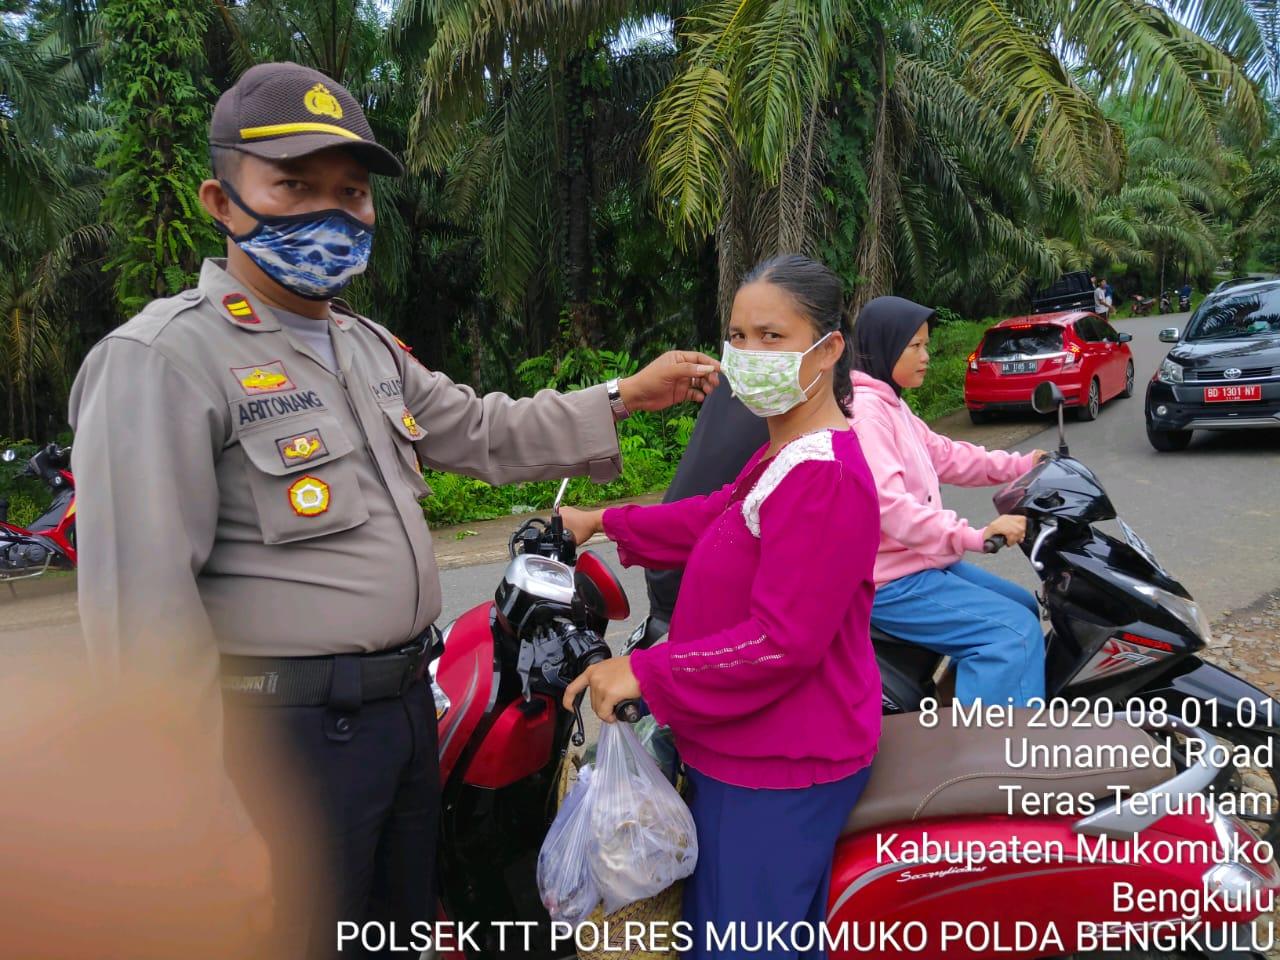 Bagikan Masker Gratis, Polsek Teras Terunjam Himbau Masyarakat Patuhi Maklumat Kapolri